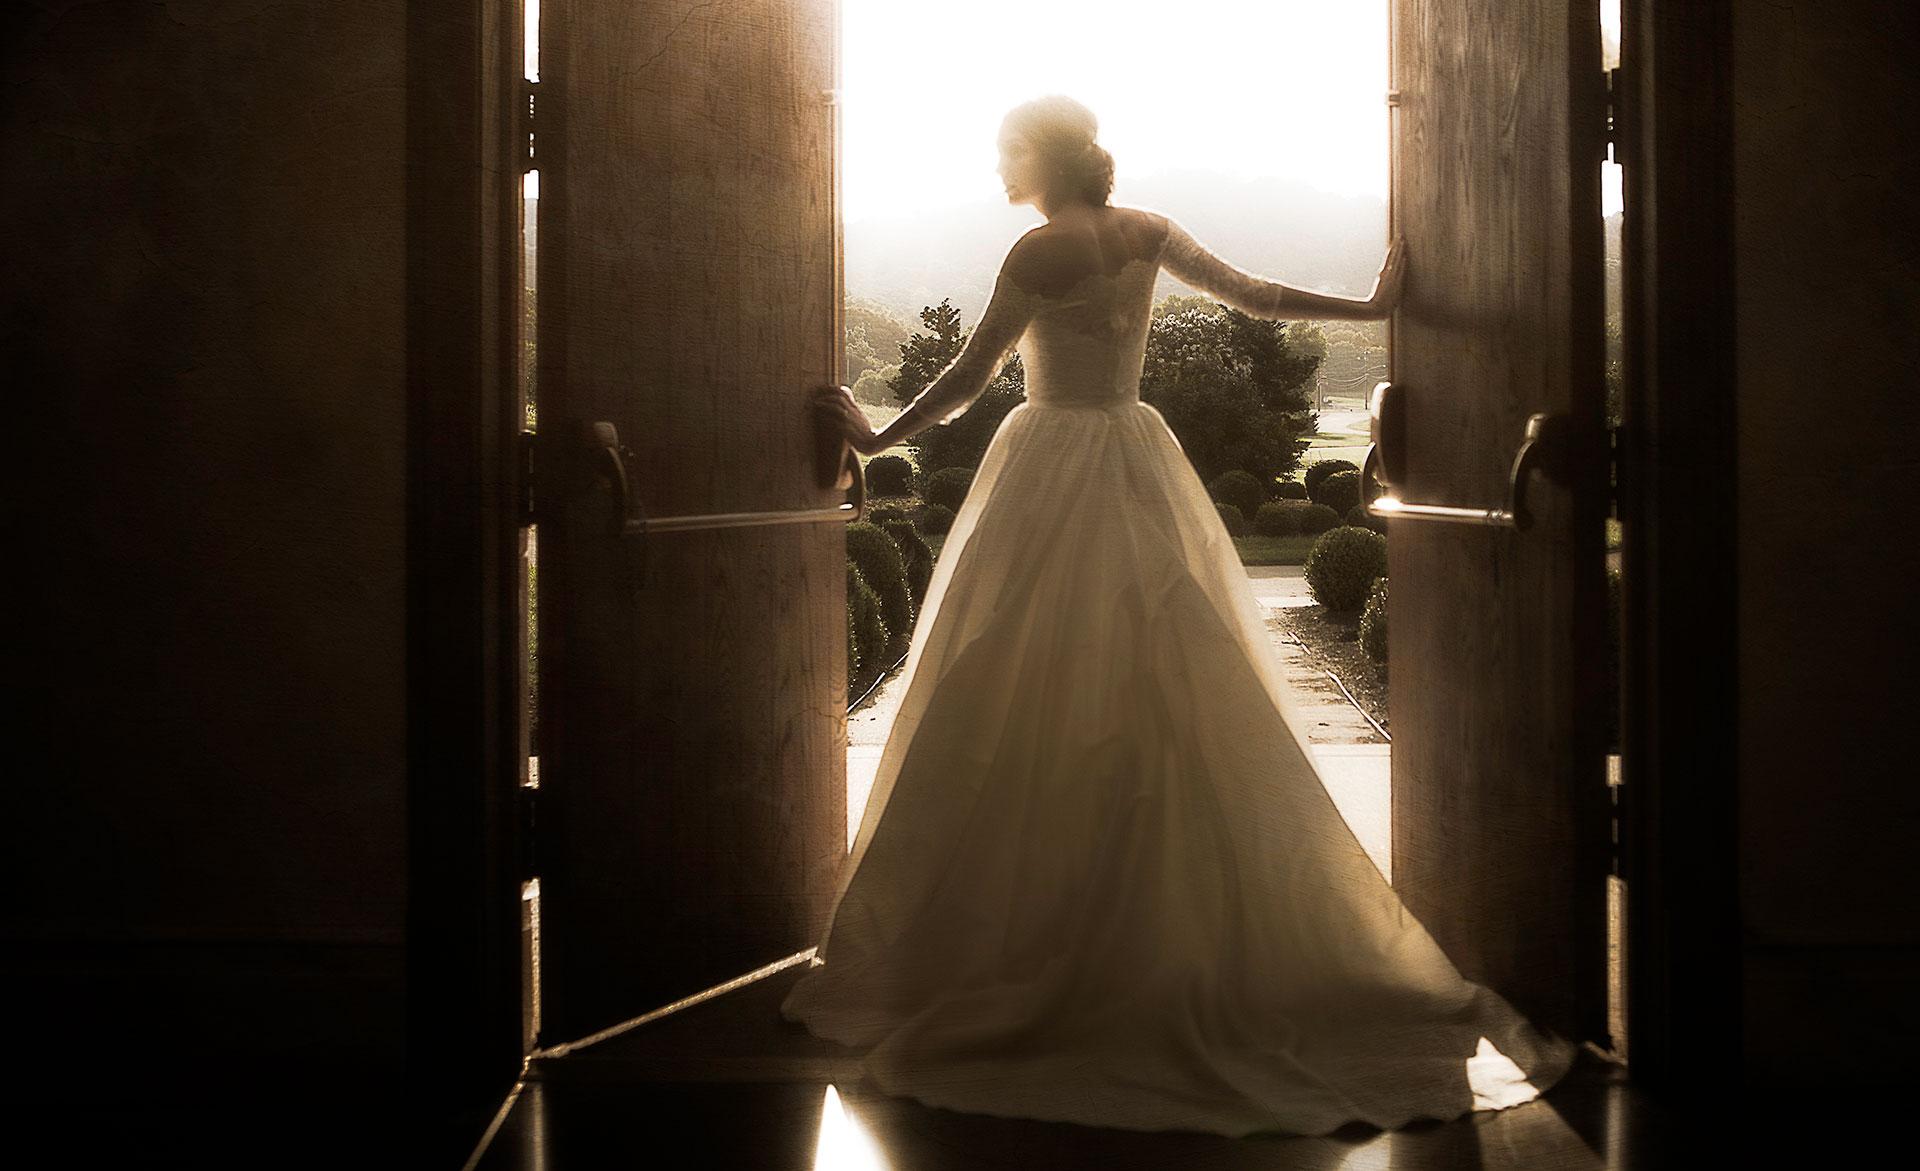 Remnant-Fellowship-Langsdon-Spoon-Wedding-Dress